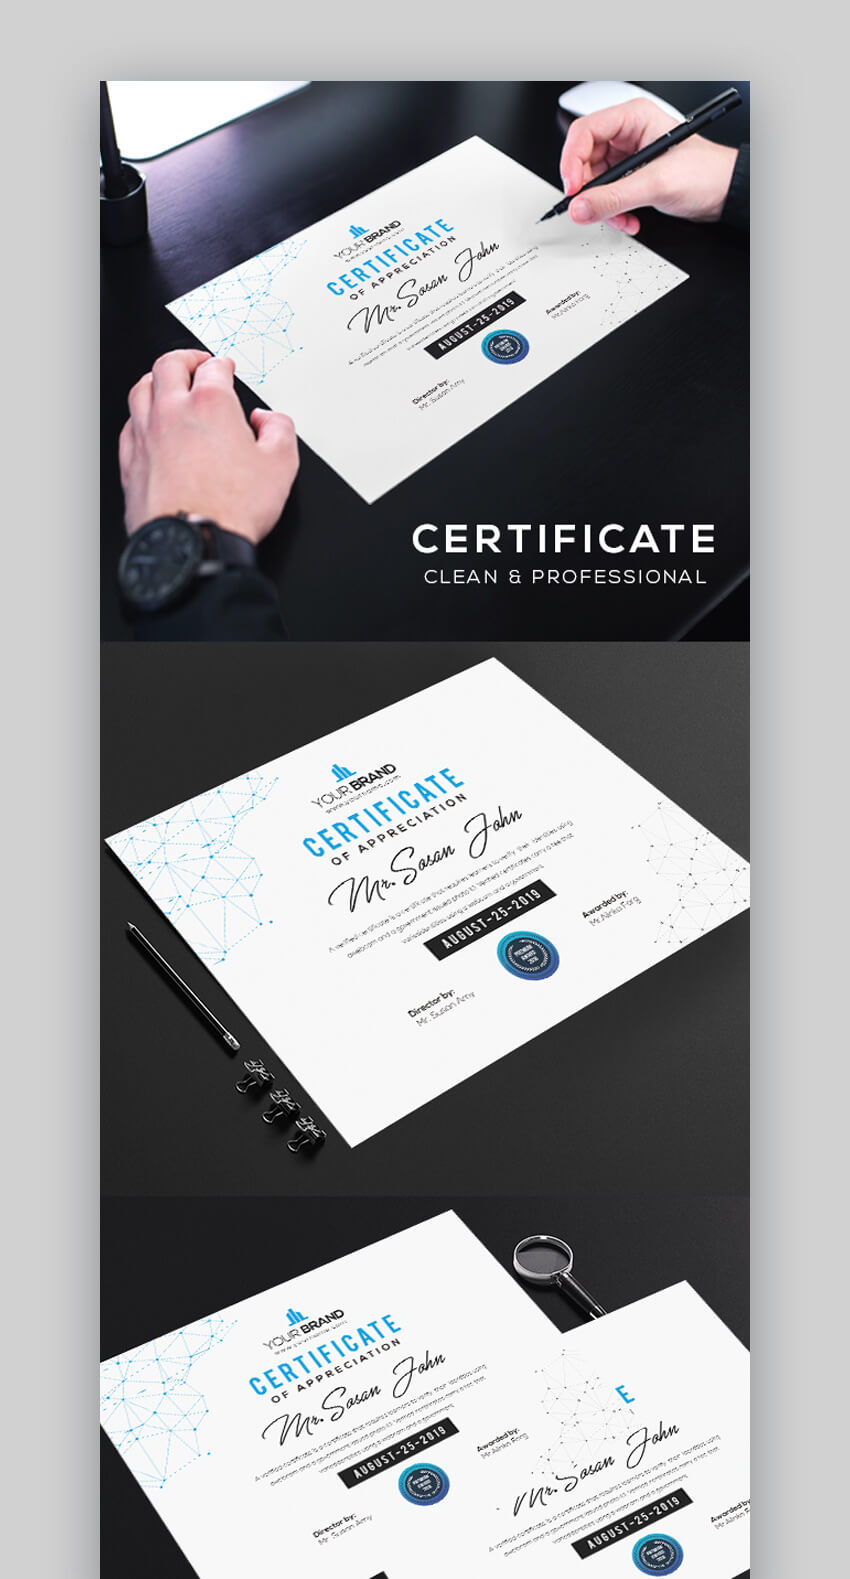 Clean  Professional Certificate